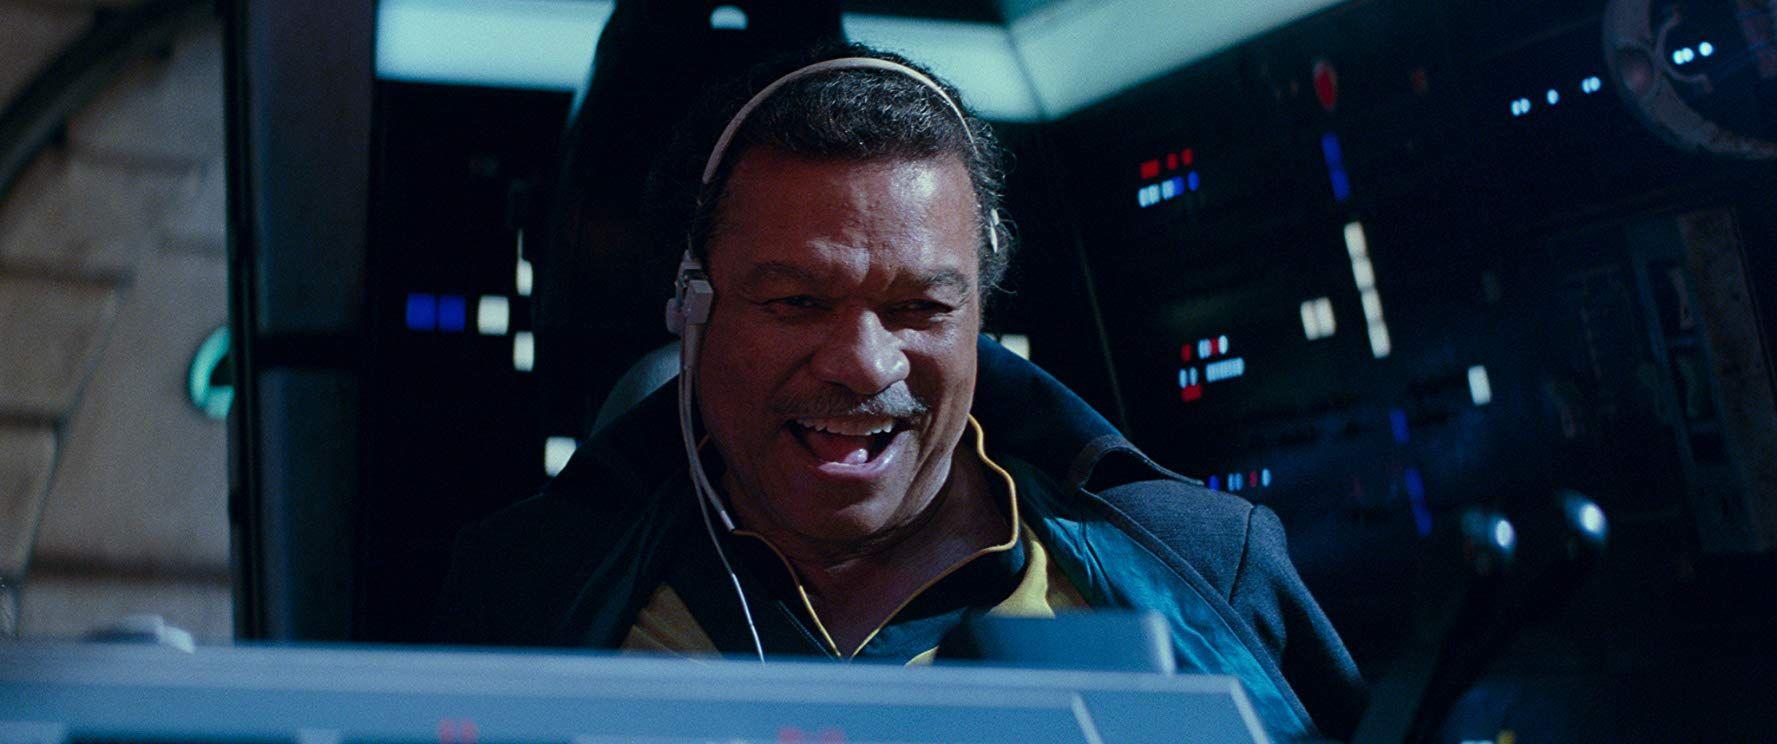 Imagen 9 de Star Wars: El Ascenso de Skywalker